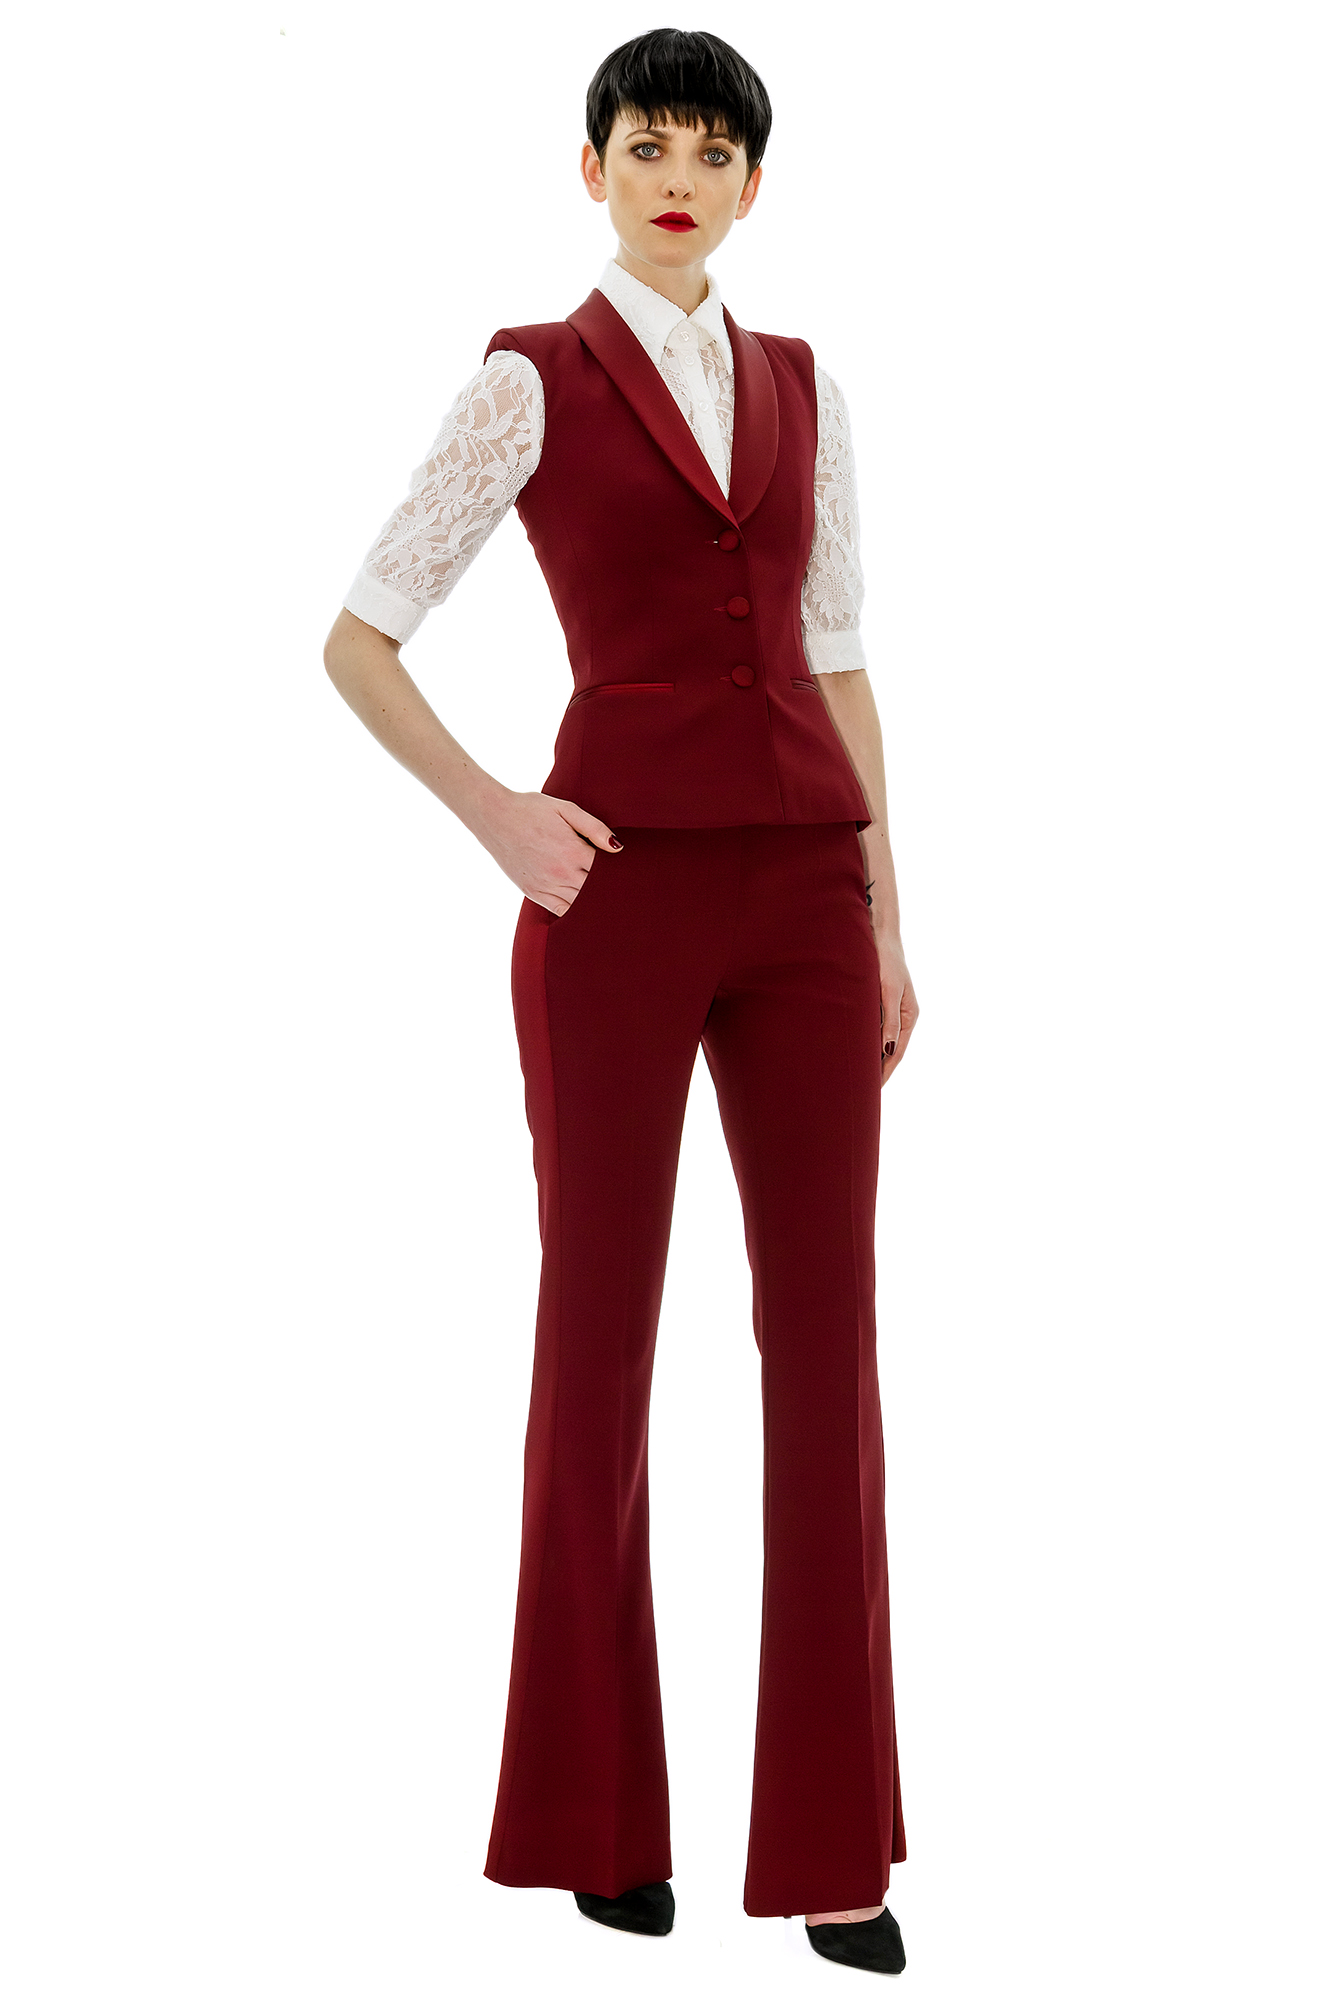 sleeveless burgundy tuxedo jacket for women stefanie renoma. Black Bedroom Furniture Sets. Home Design Ideas